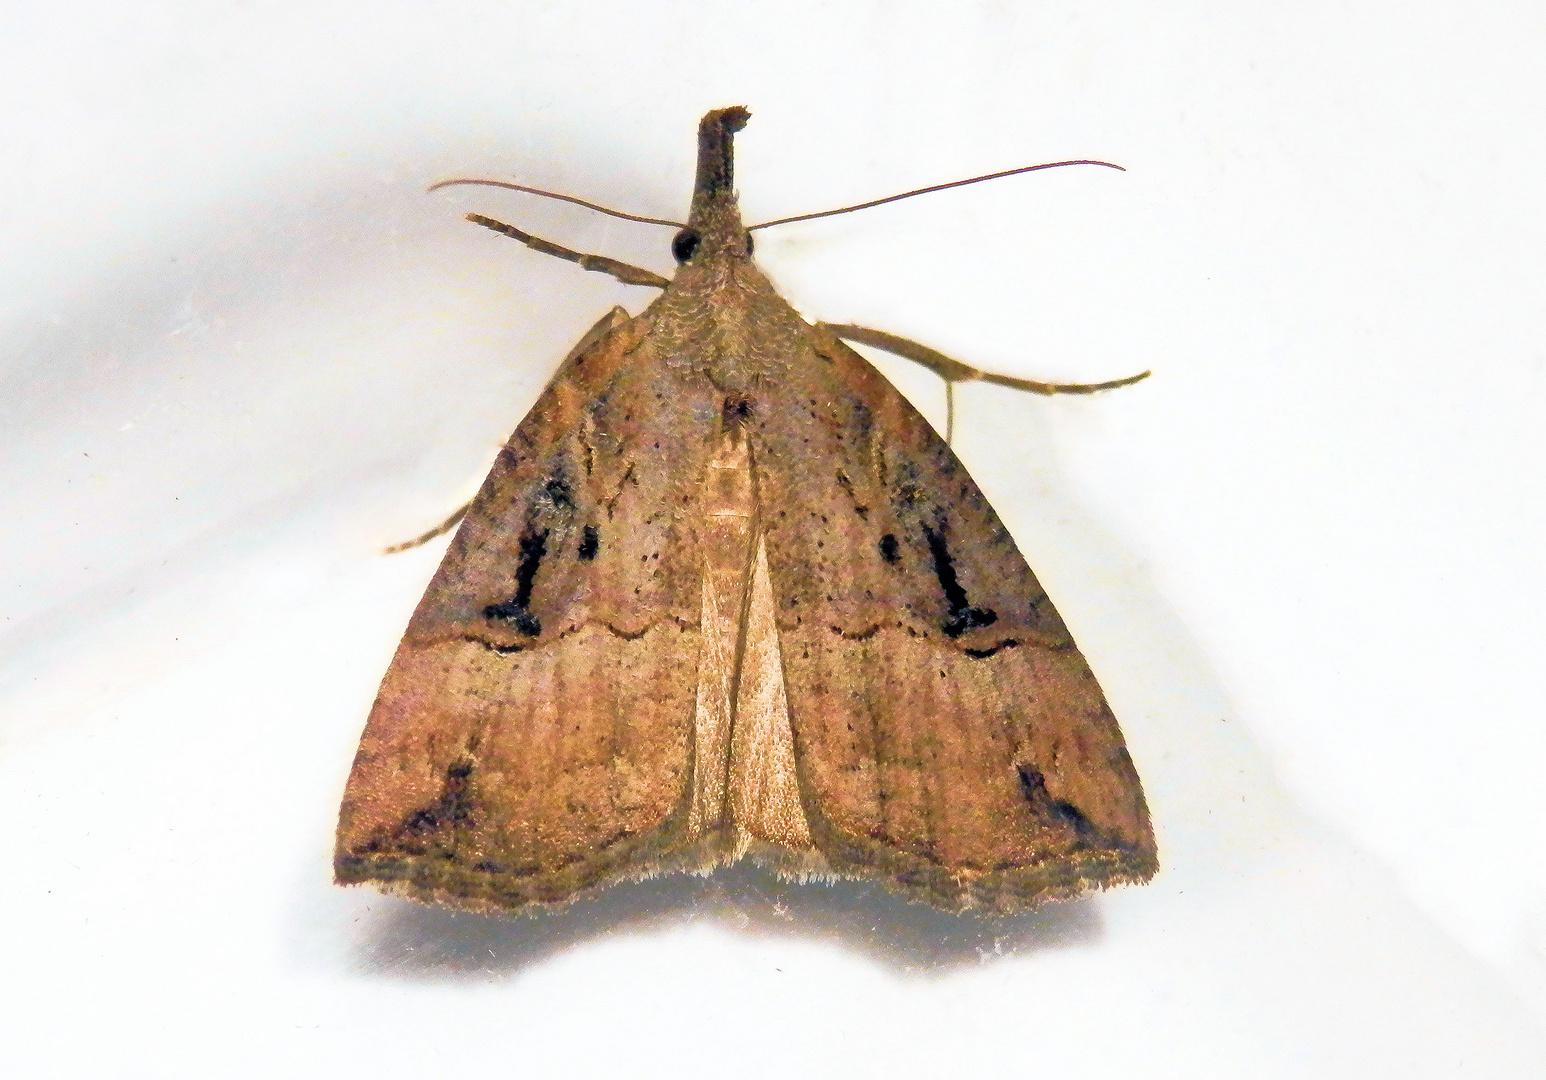 Hopfen-Schnabeleule (Hypena rostralis) im November